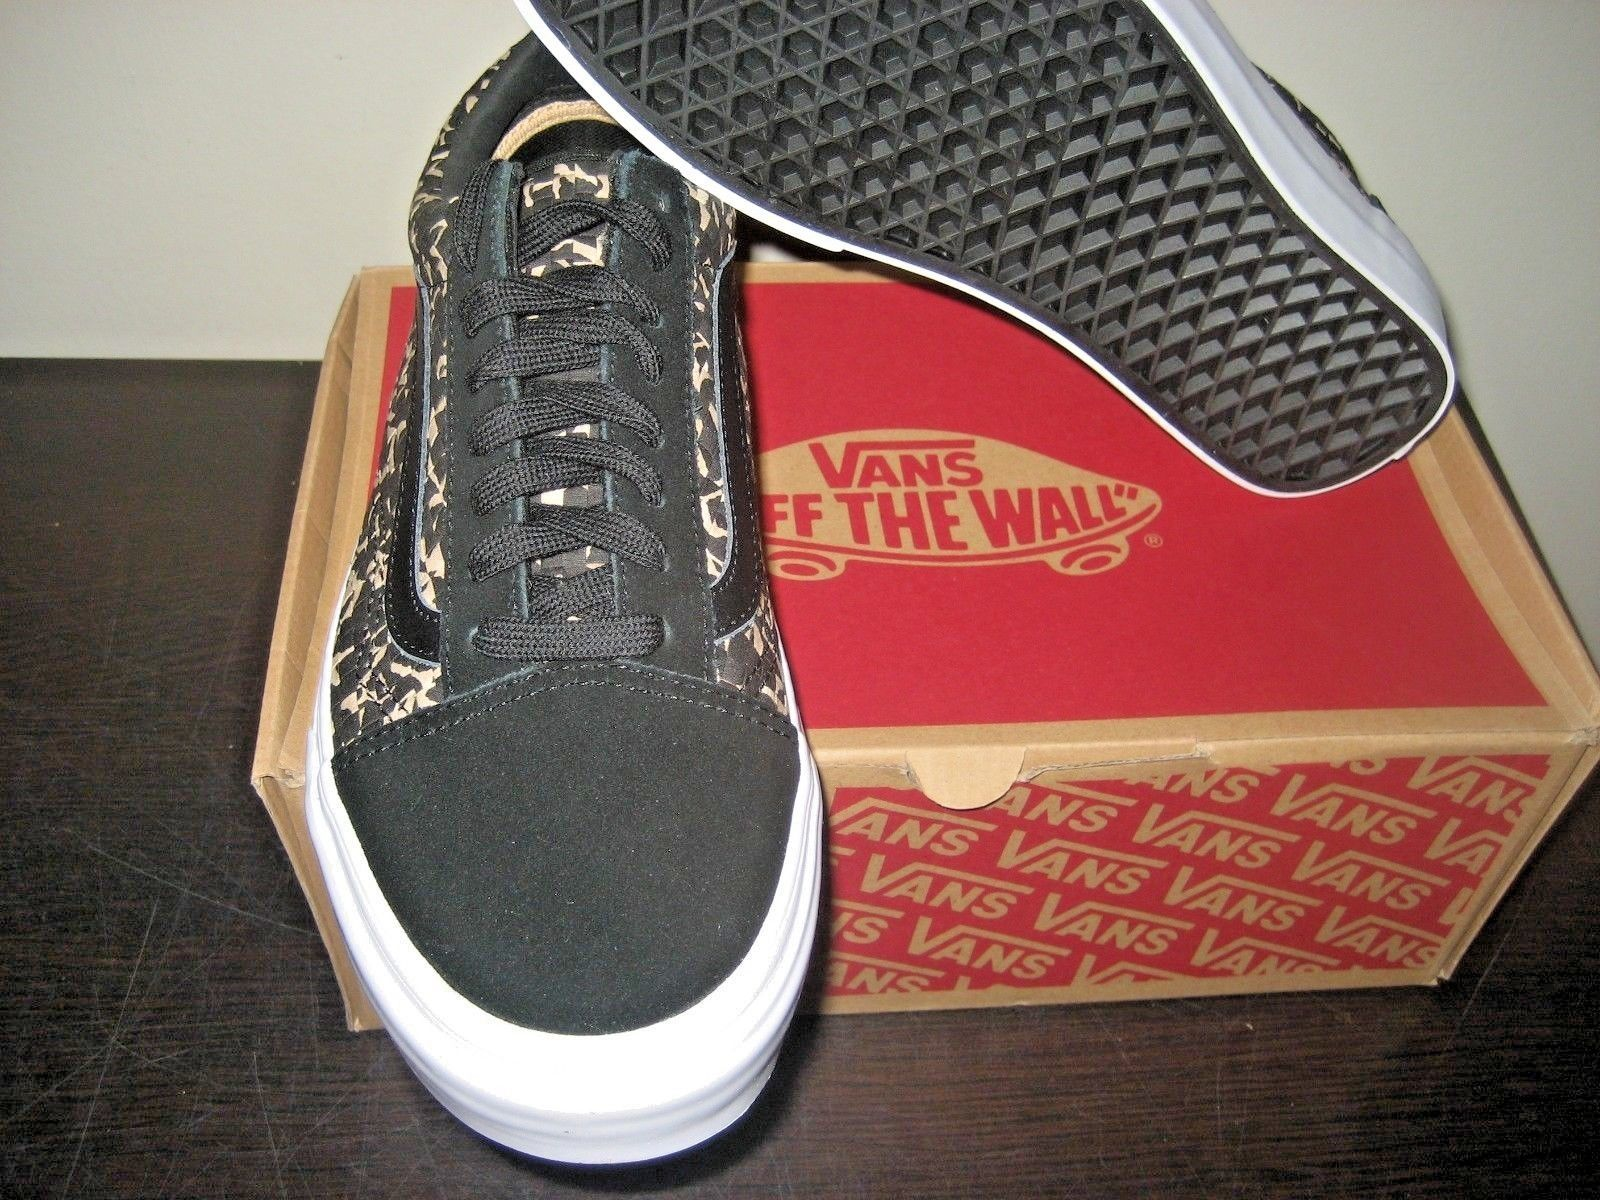 40481f52a0d ... Vans Mens Old Skool DX Woven Textile Multi Black Suede Skate shoes Size  8 NWT